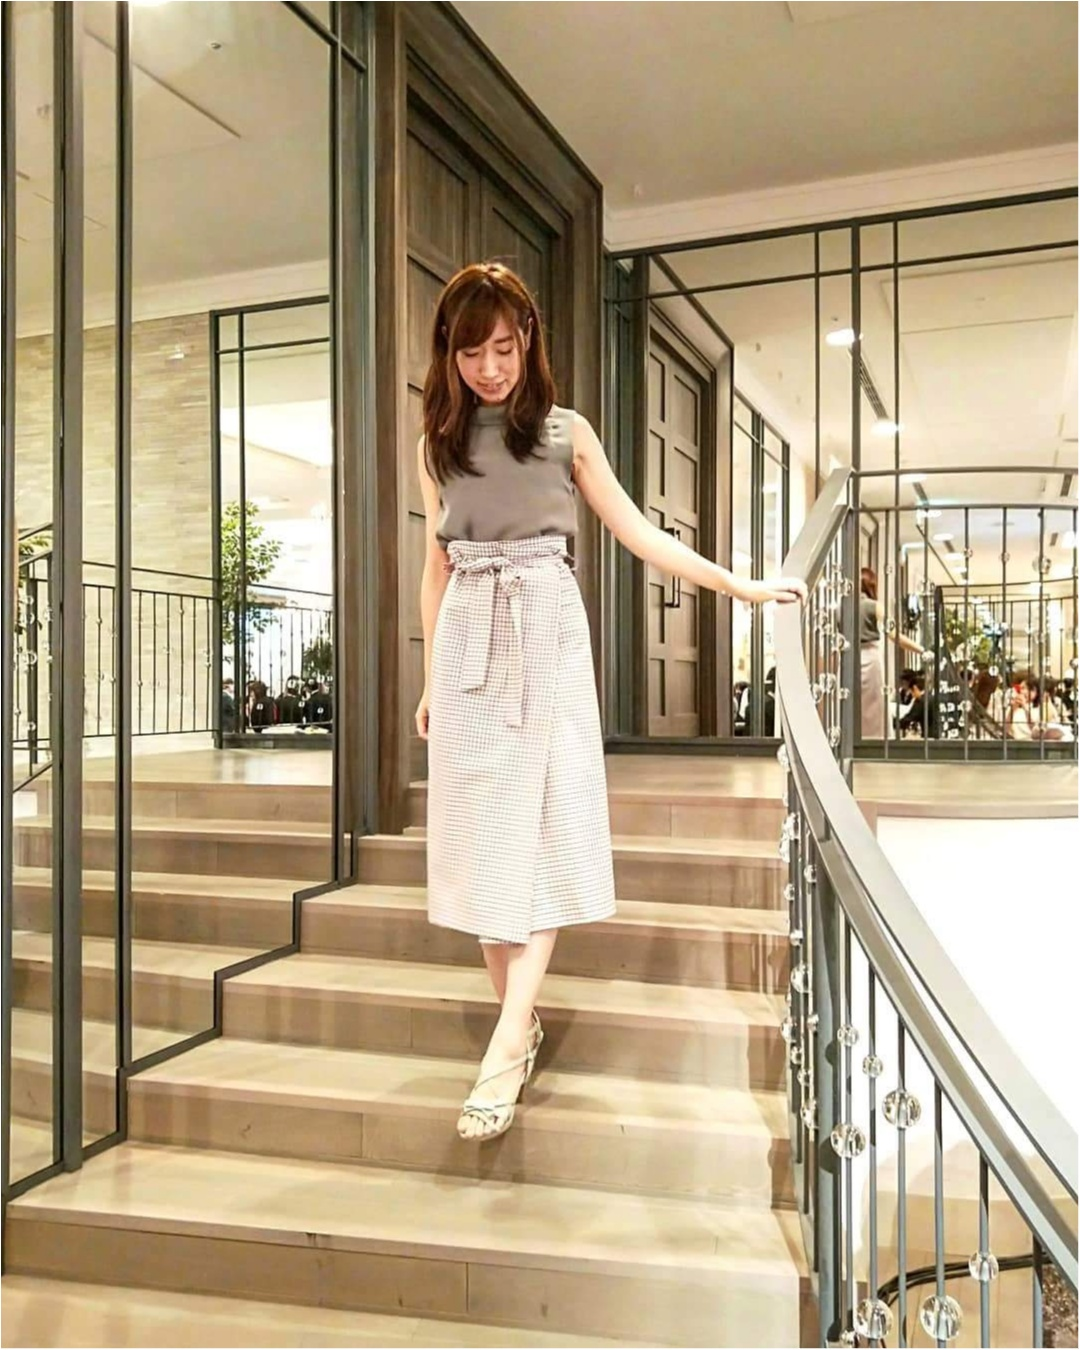 【ZARAセール】チェック柄ラップスカートが1000円台!ハイウエストデザインがお気に入り!_1